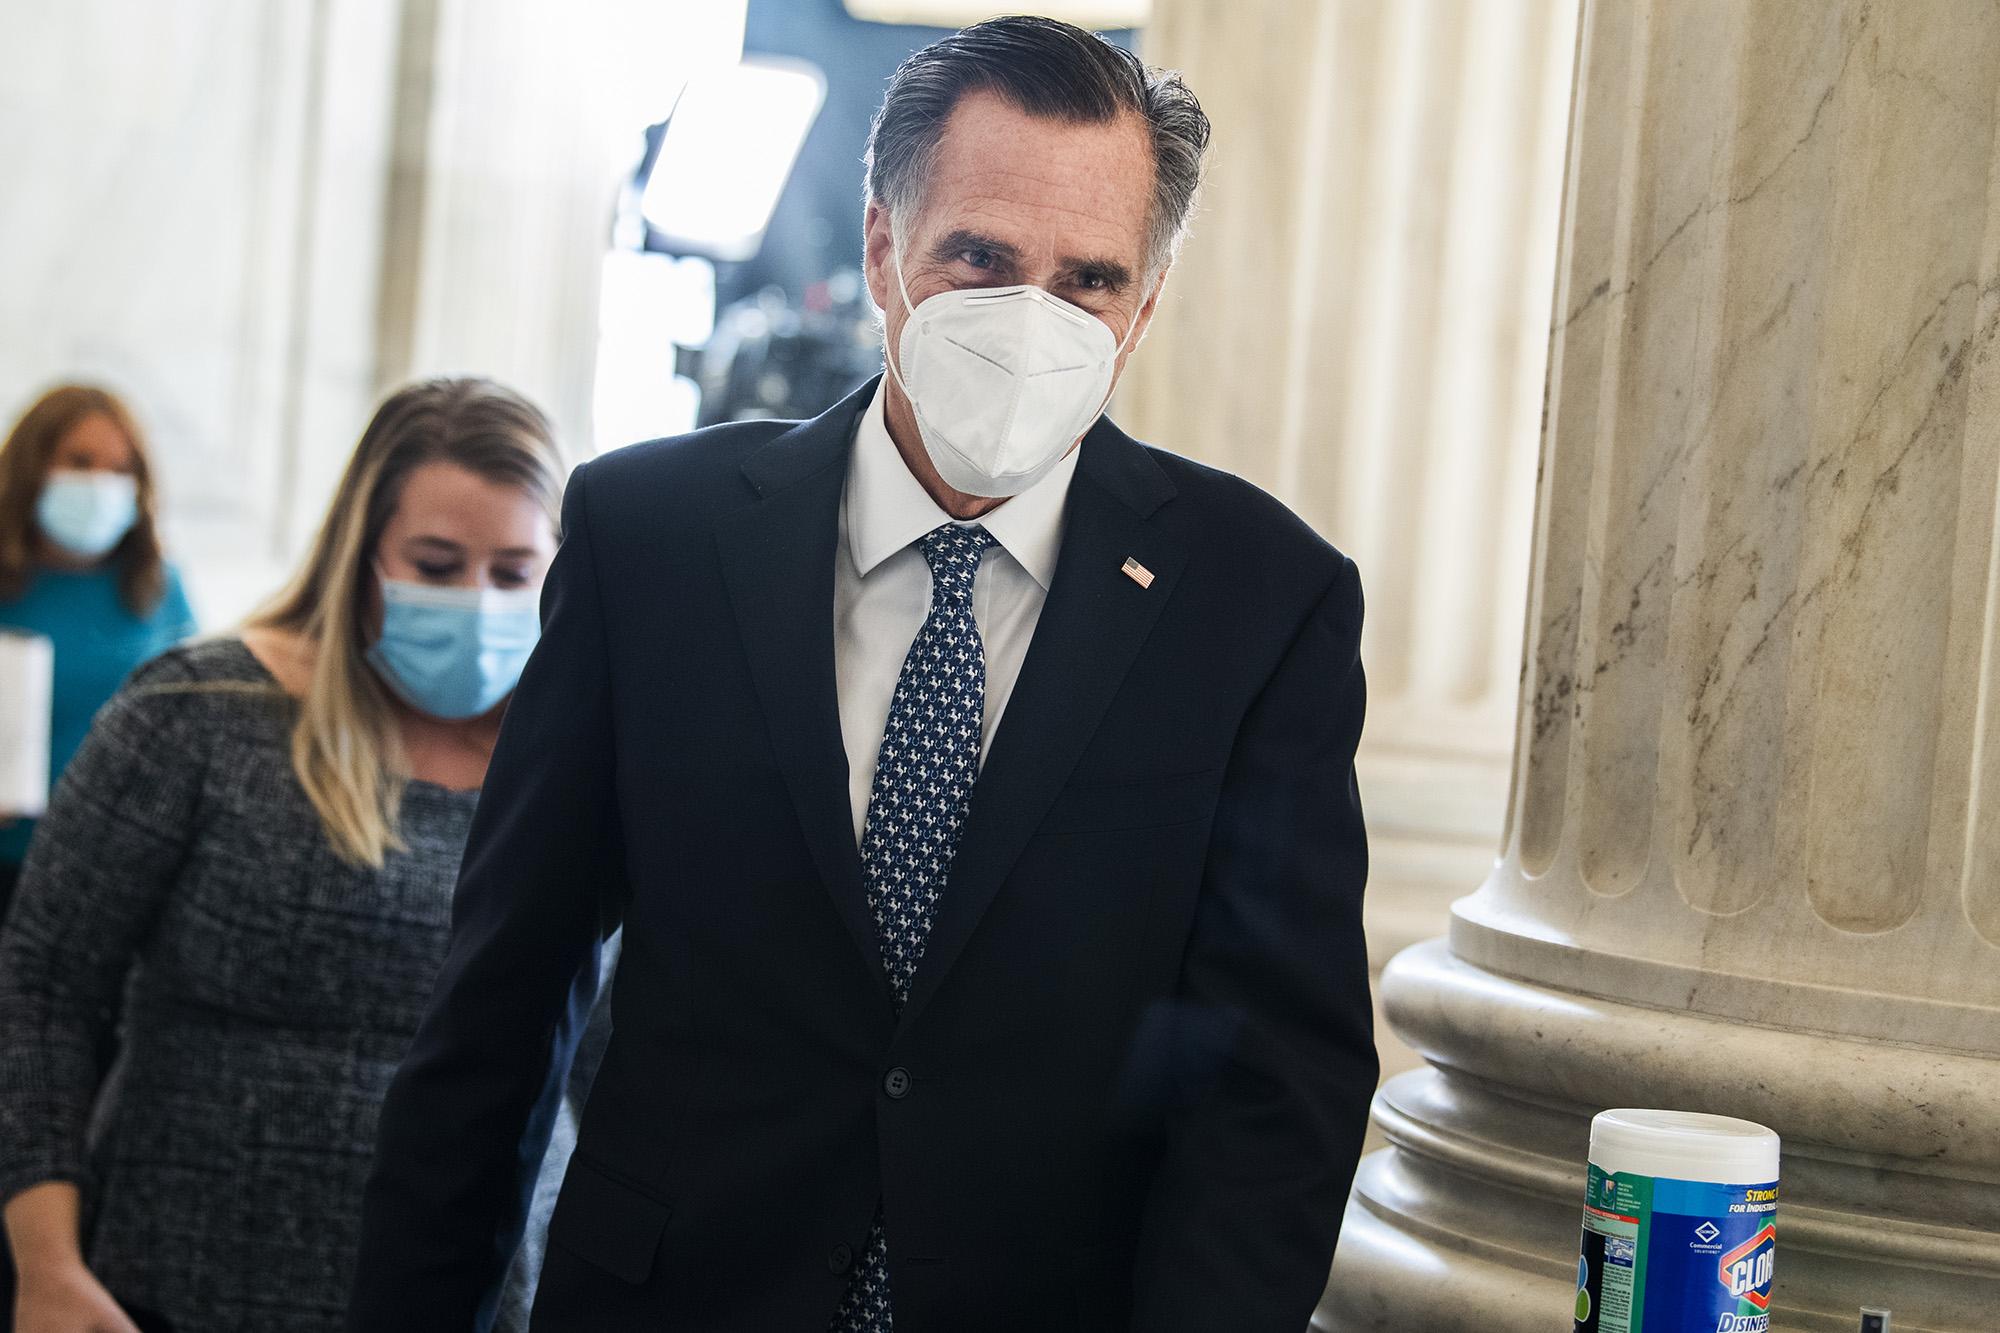 Sen. Mitt Romney, R-Utah, walks in the Russell Building on Capitol Hill in Washington DC, on Tuesday, December 15.